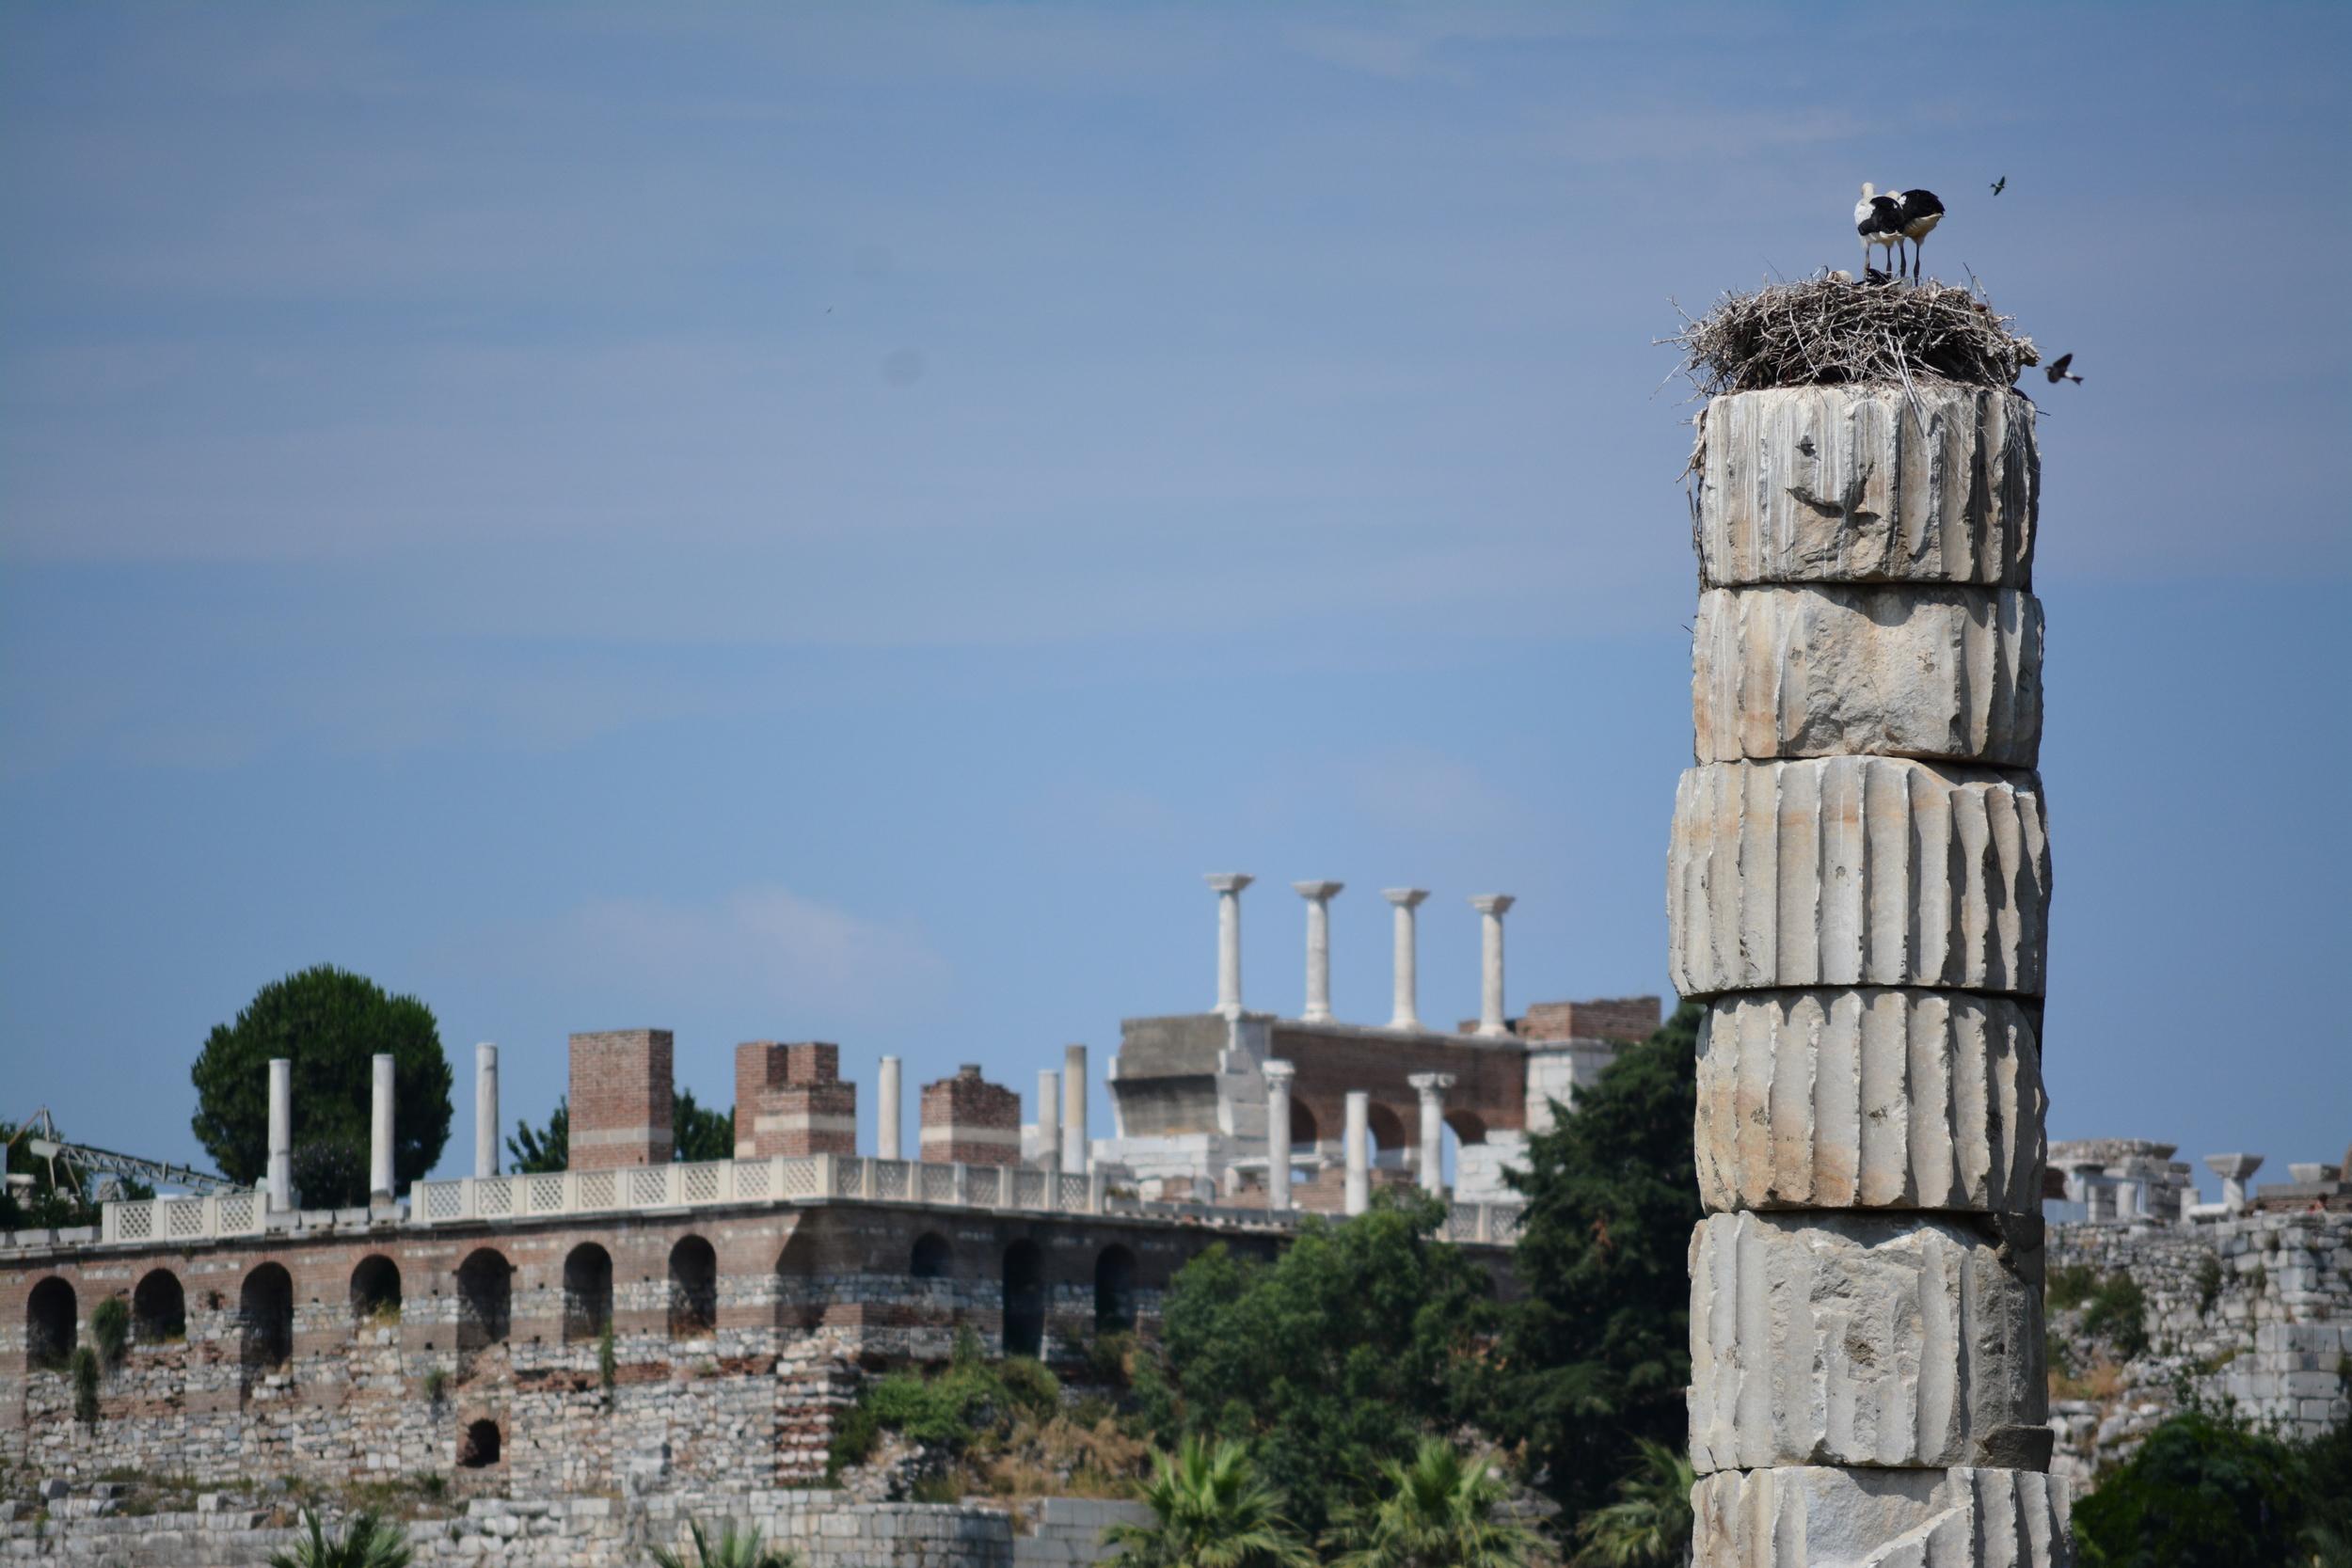 Photo: Ali Mert Özgün /Photography Tour Guide - St. John Basilica view from Artemis Temple